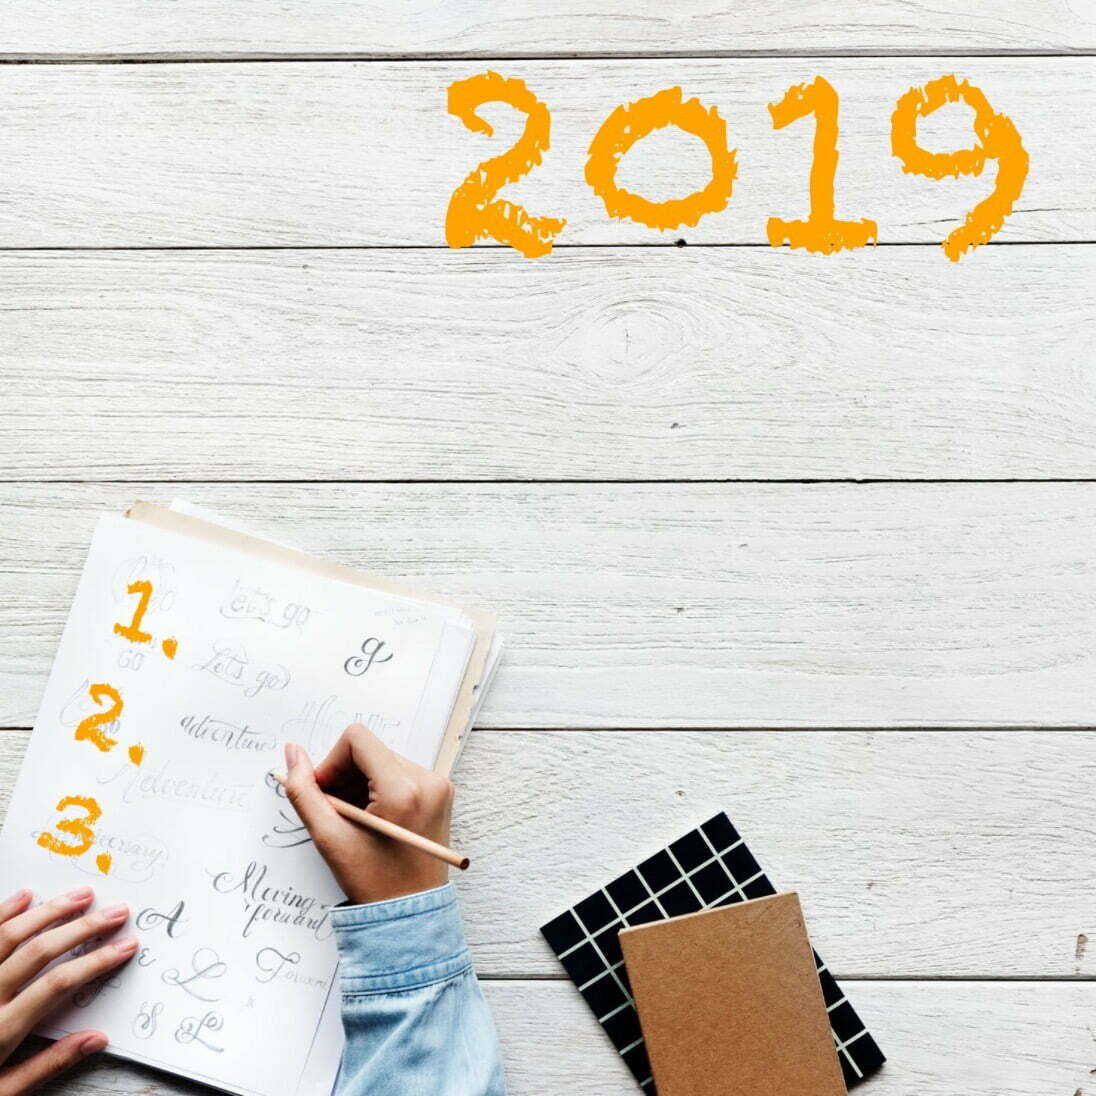 Eco friendly 2019 tips